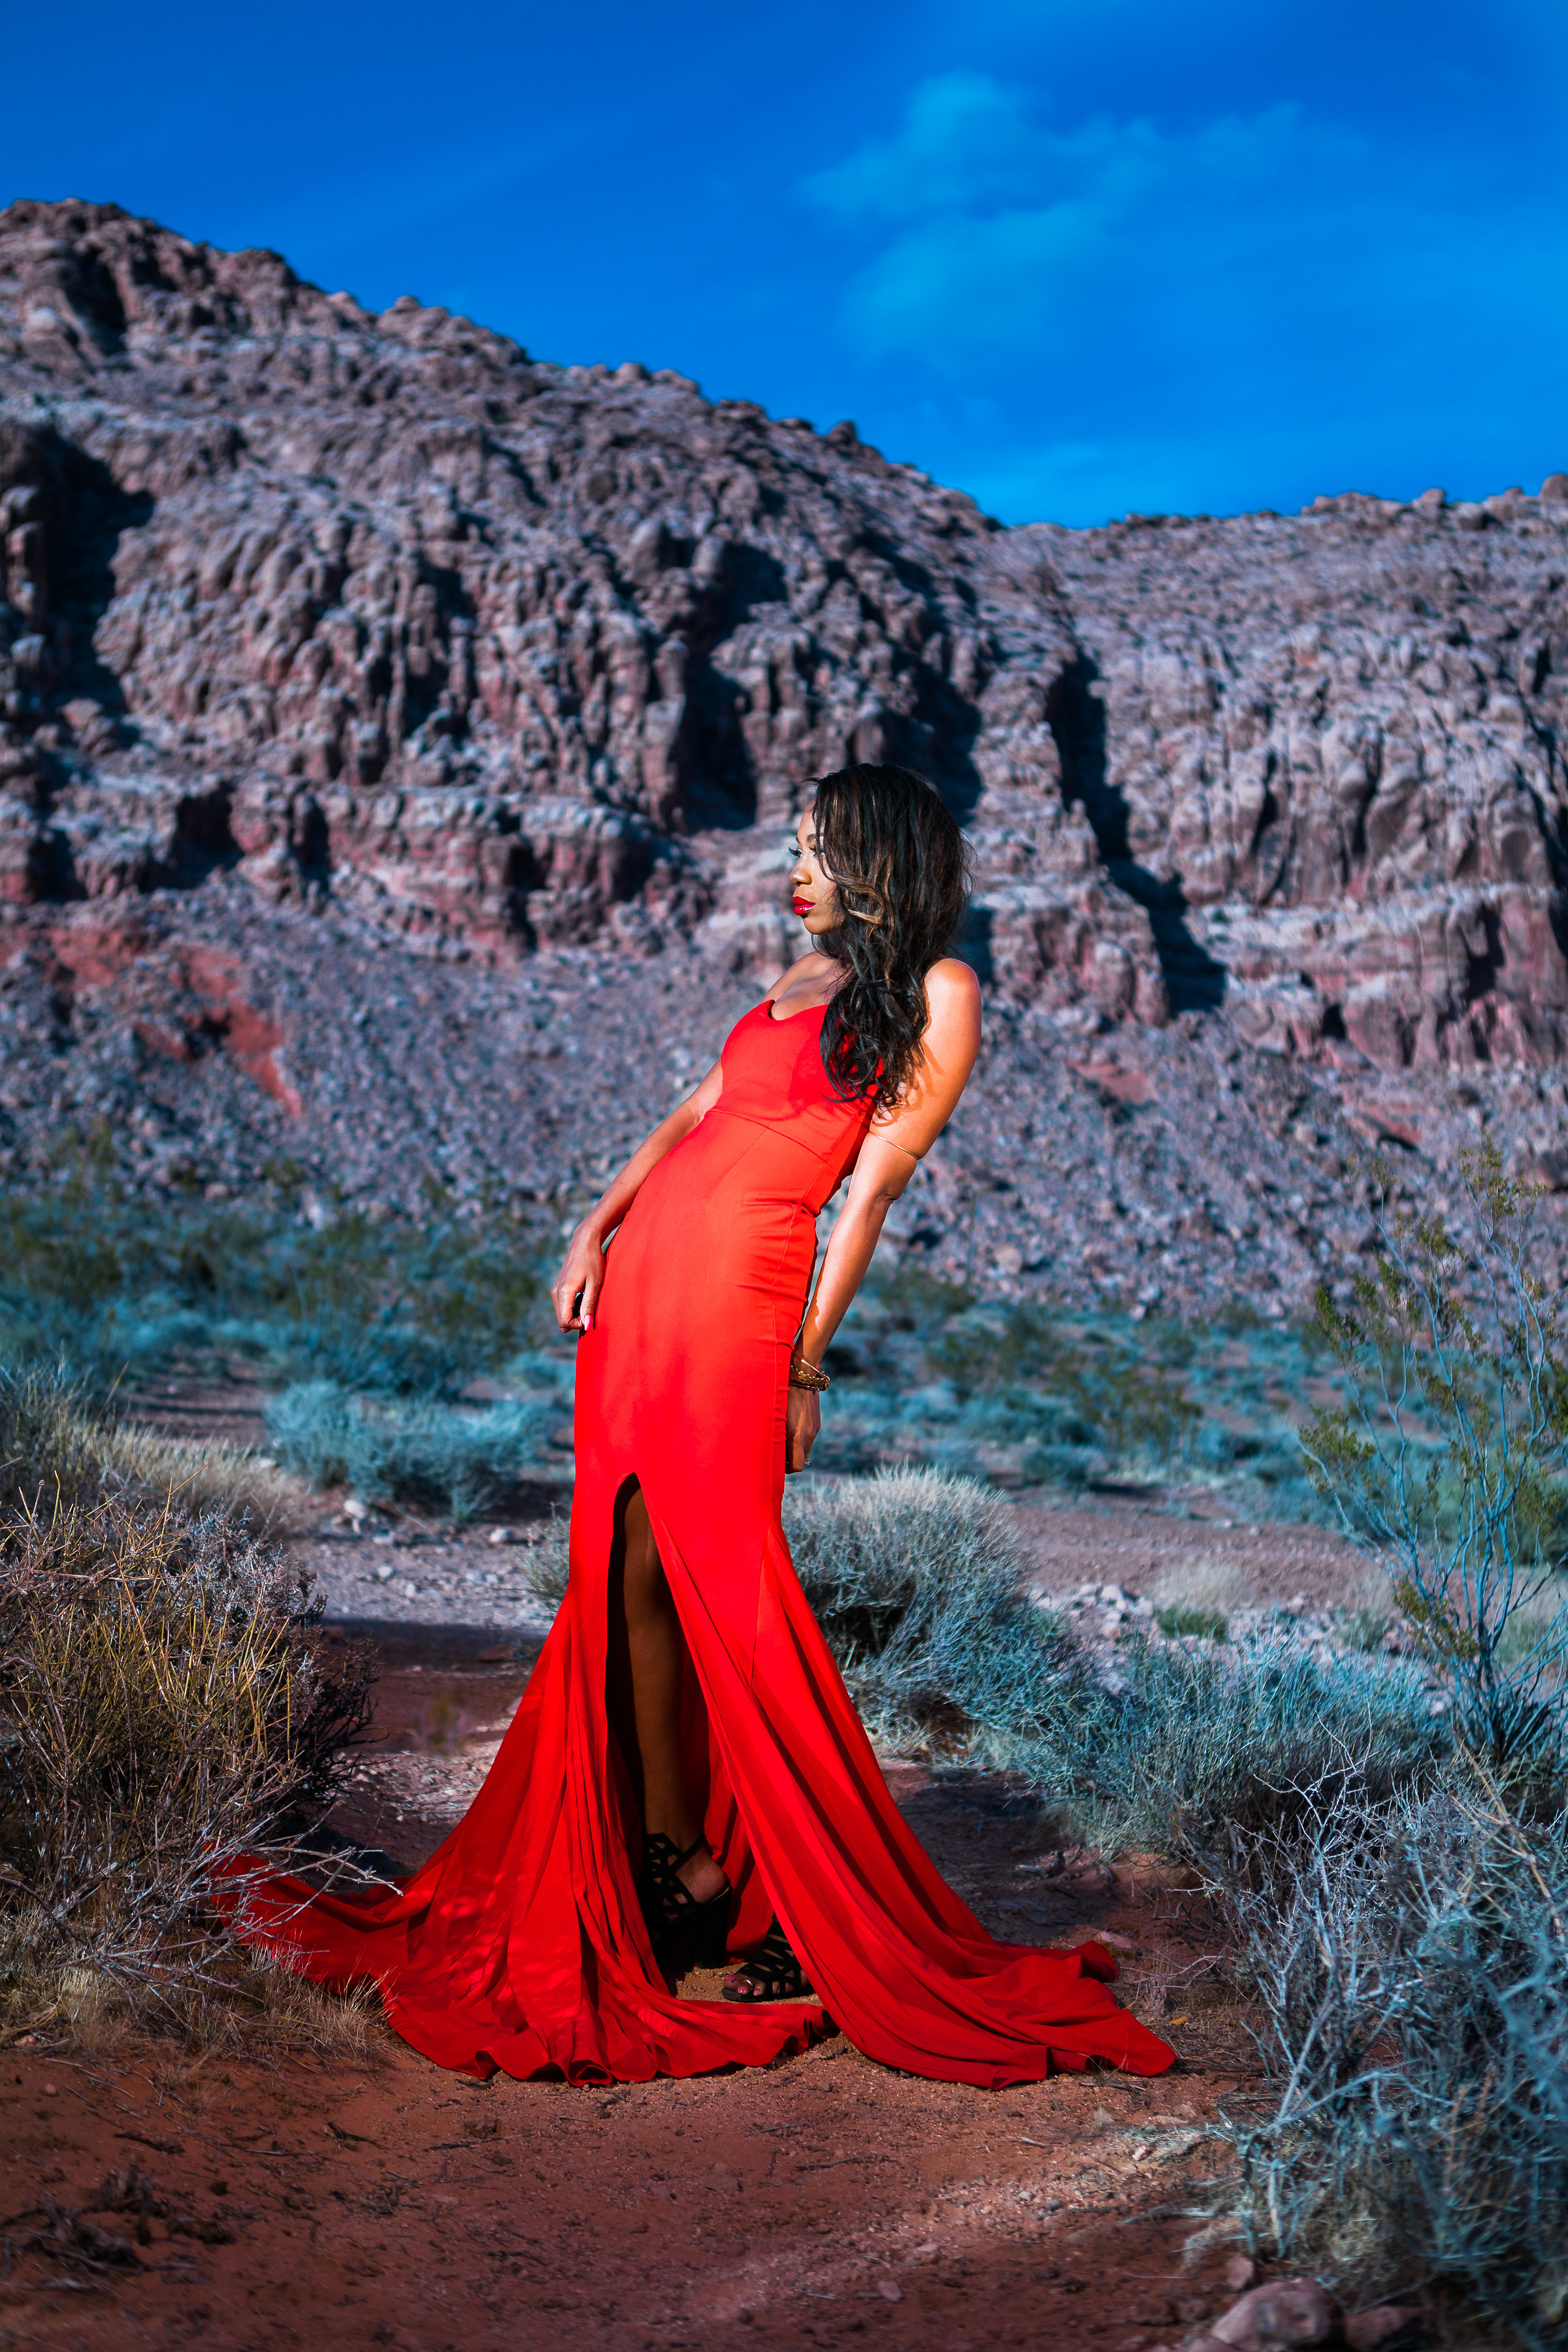 New_York_Photographer_Las_Vegas_Desert-249.jpg